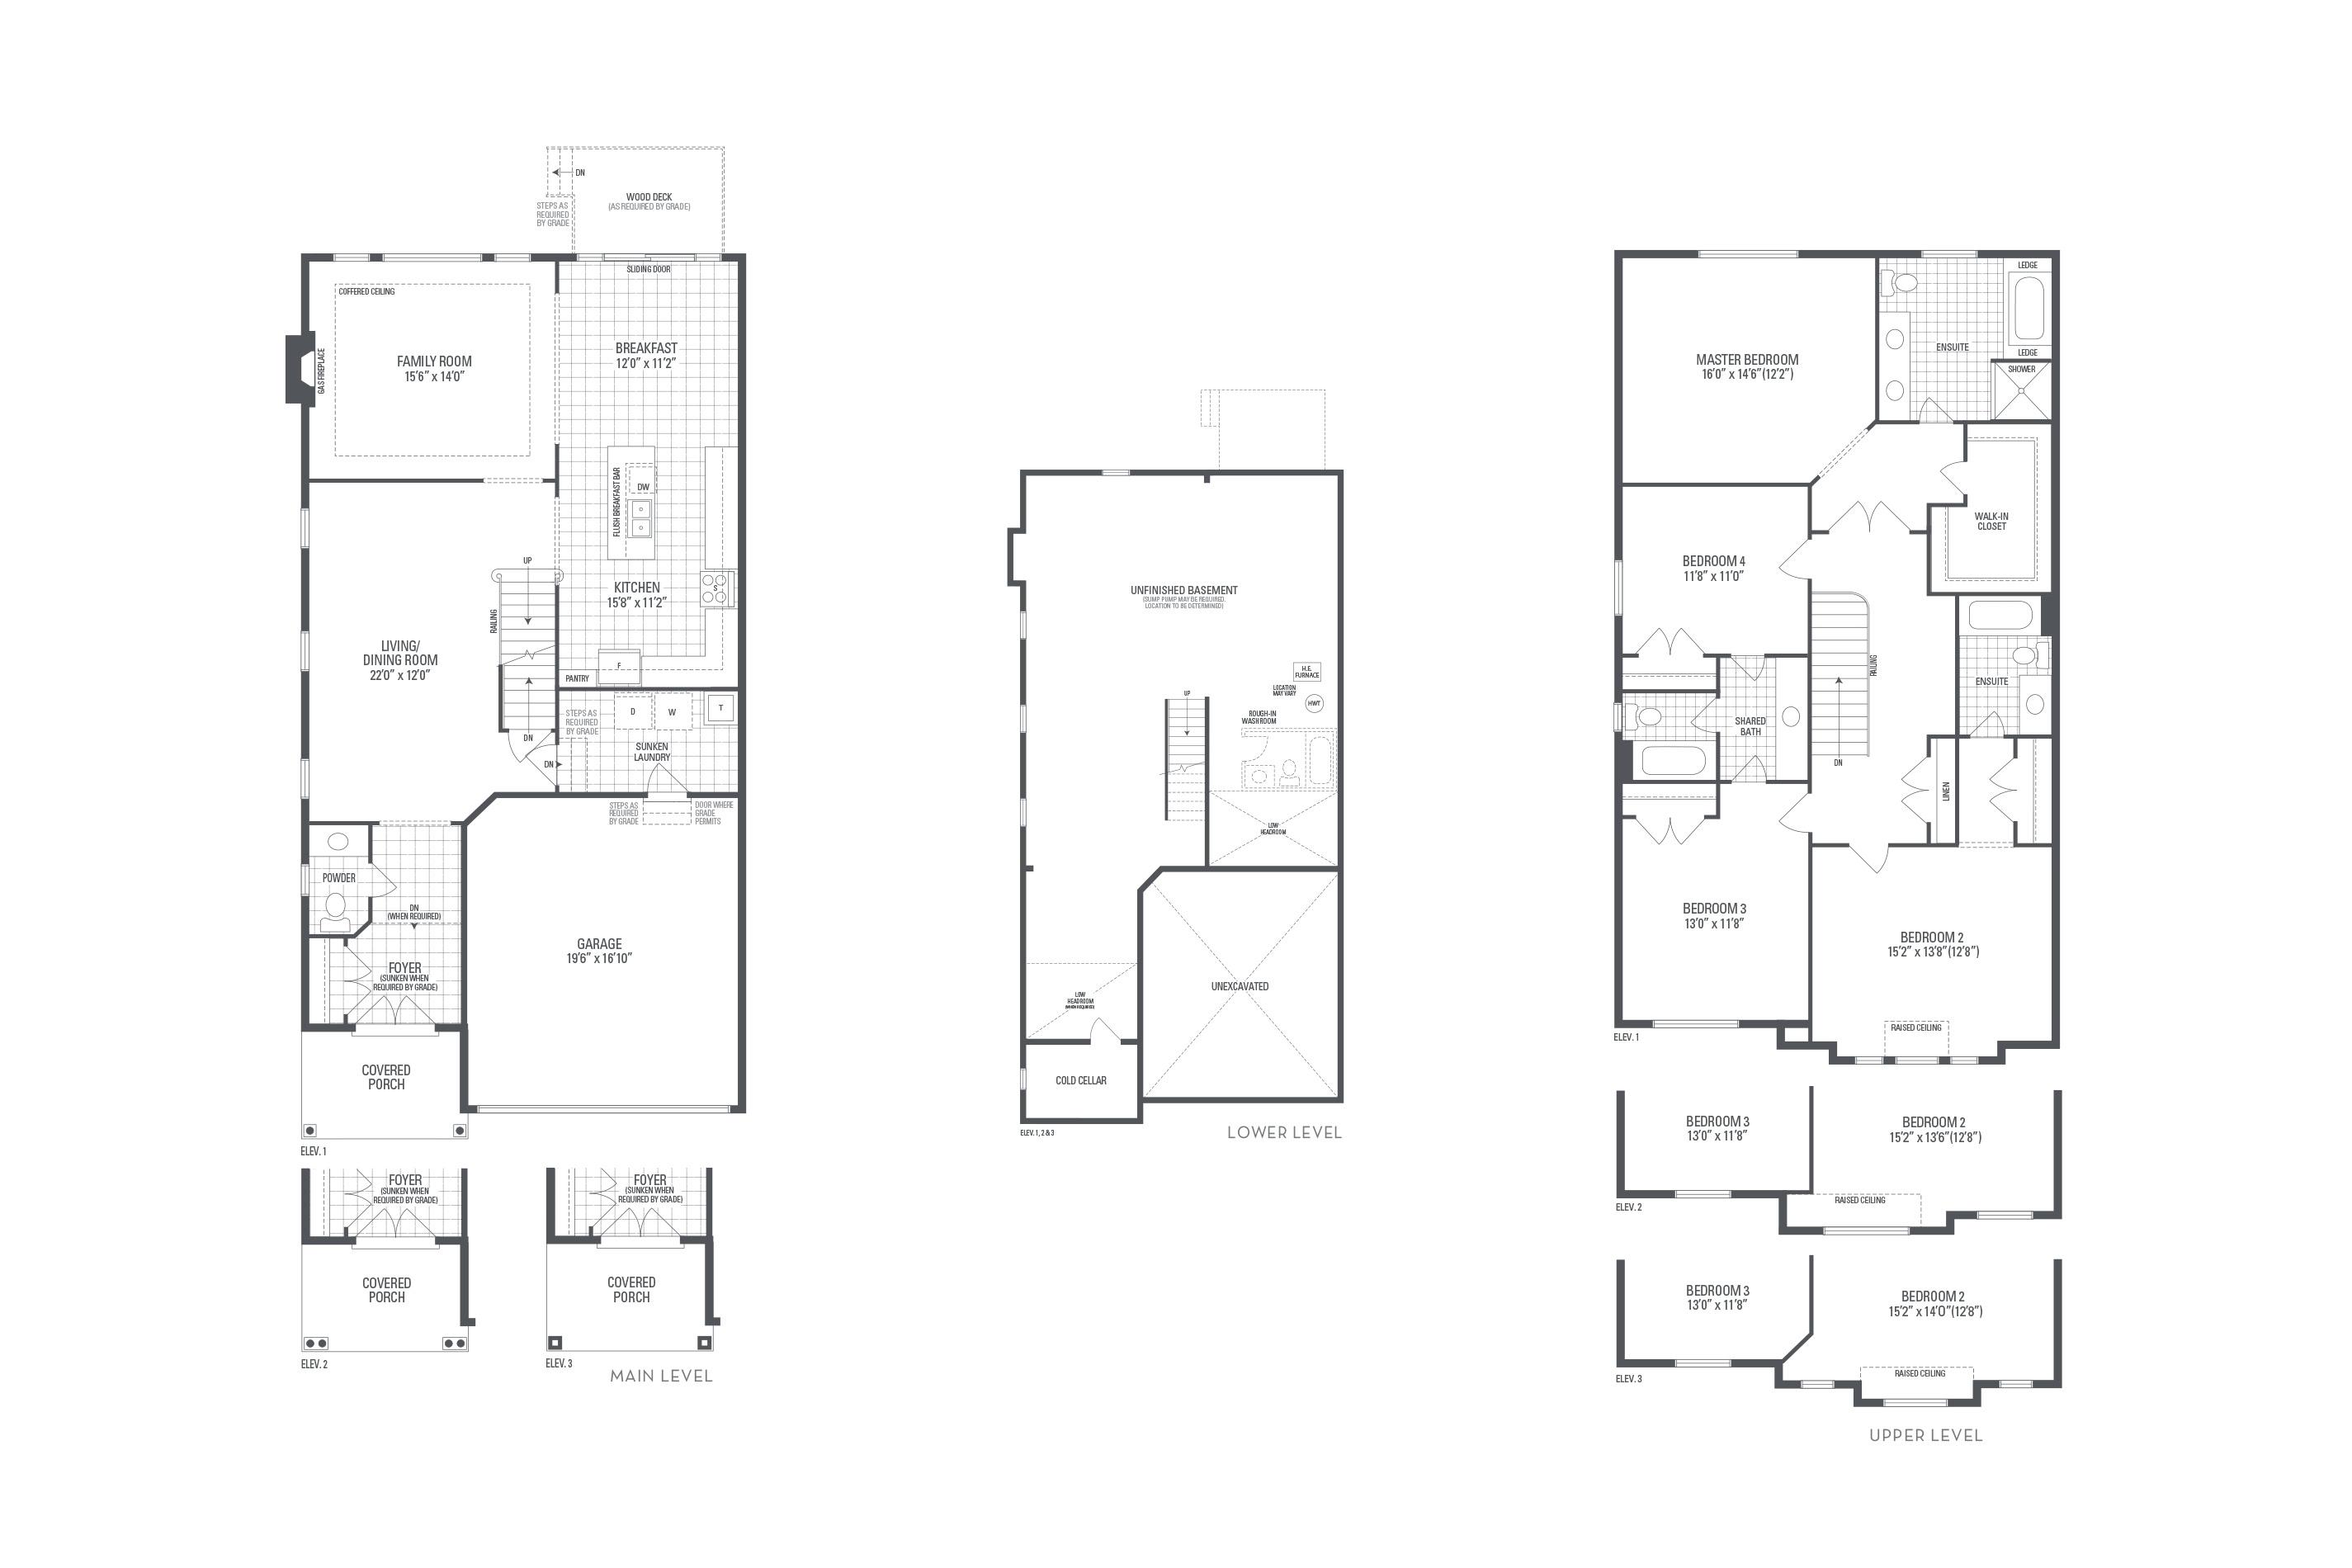 Bronte 08 Elev. 1 Floorplan